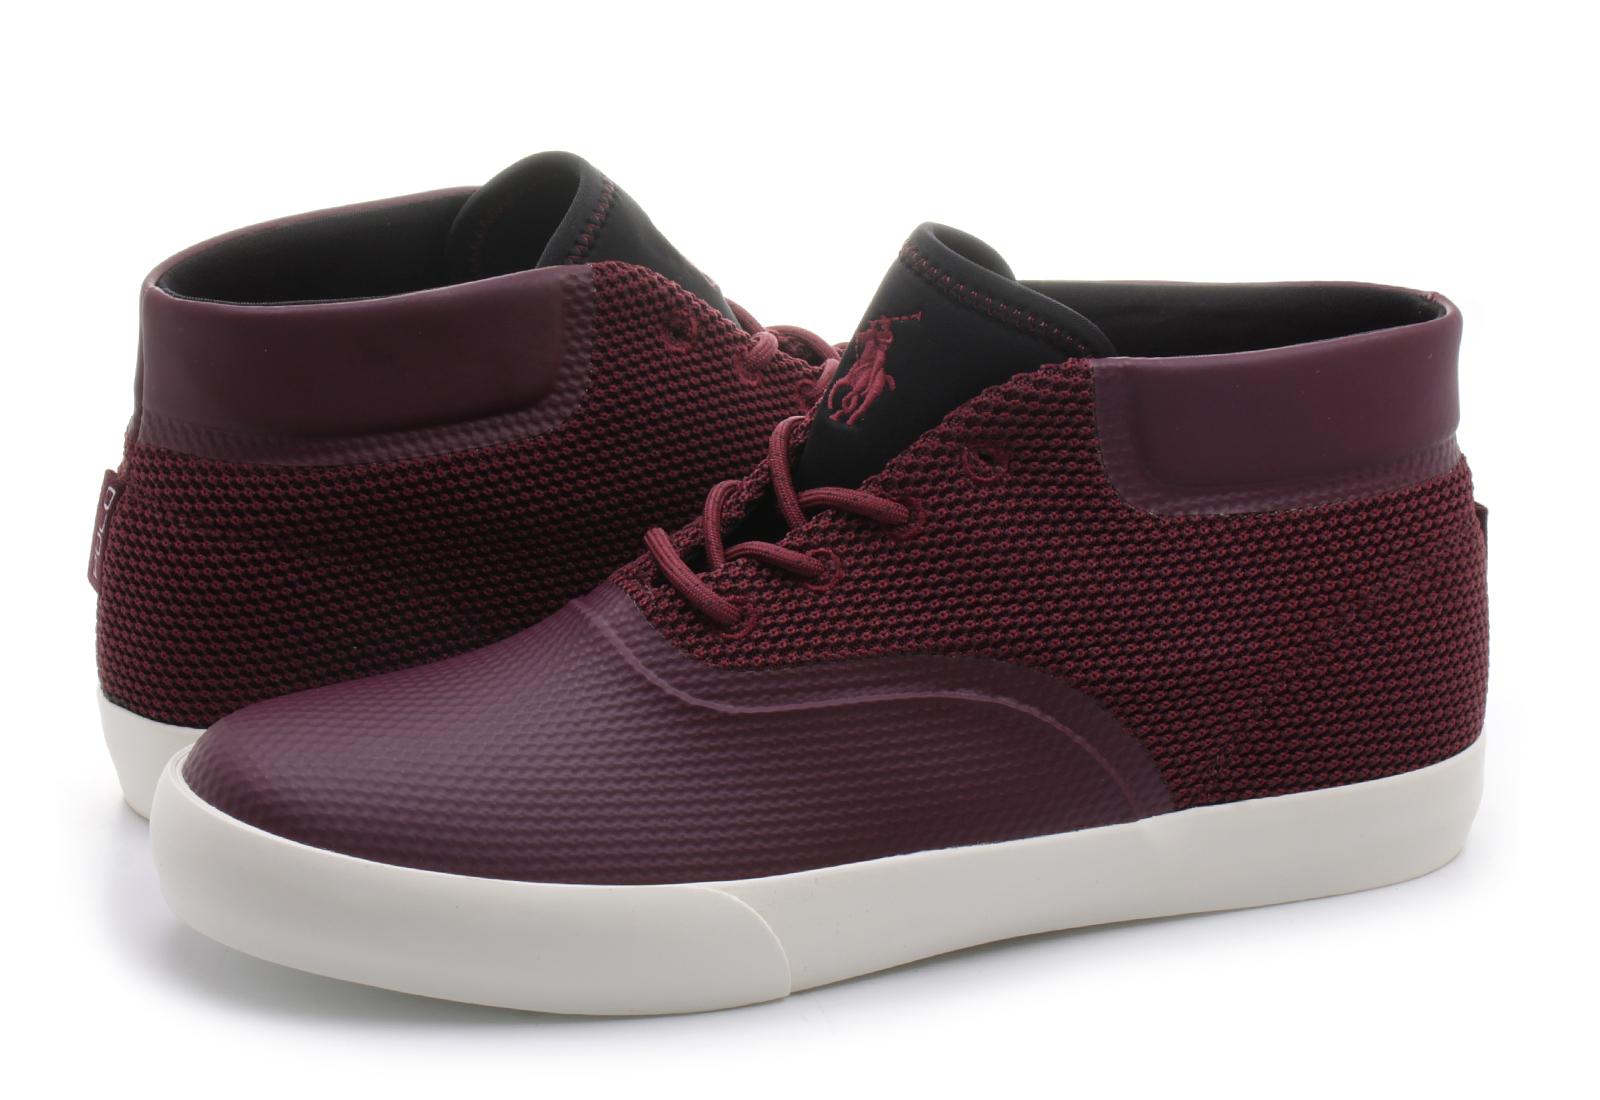 Polo Ralph Lauren Shoes Vadik-ne